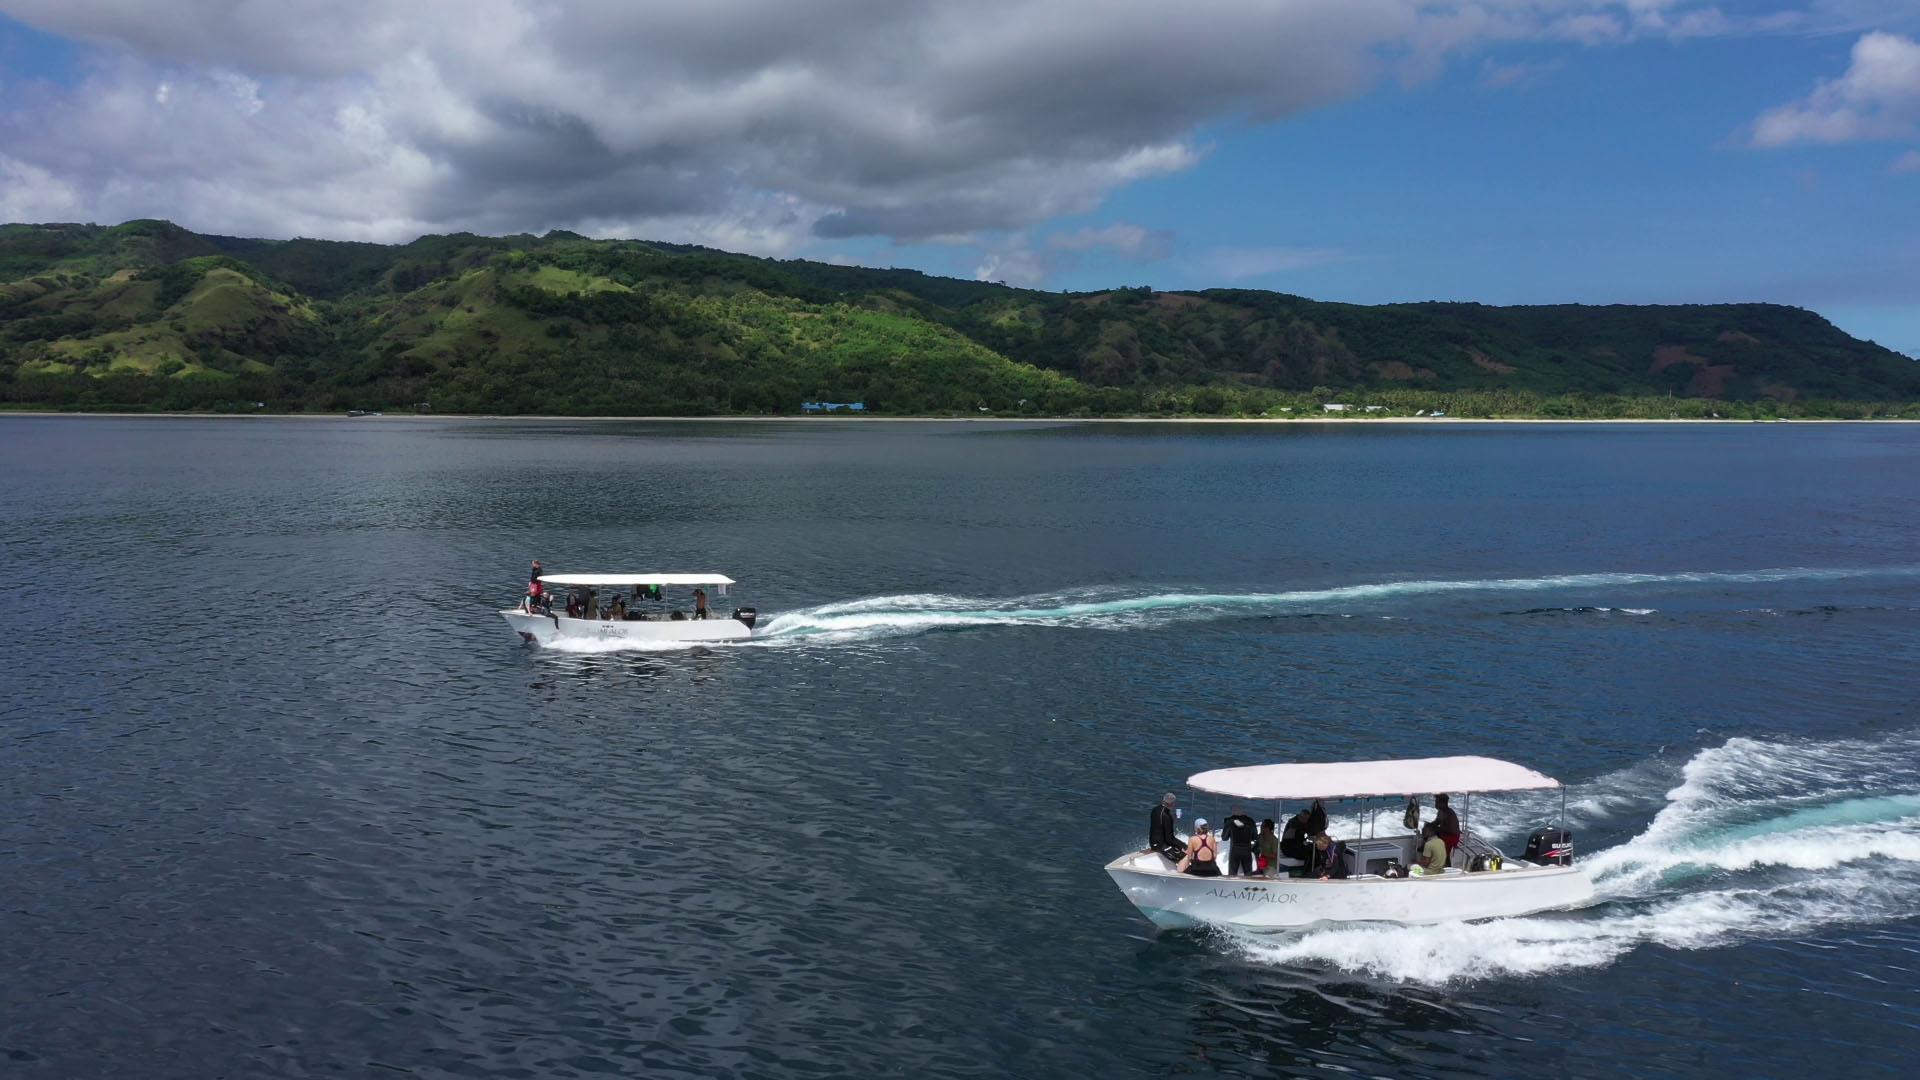 Alami Alor speedboats side by side